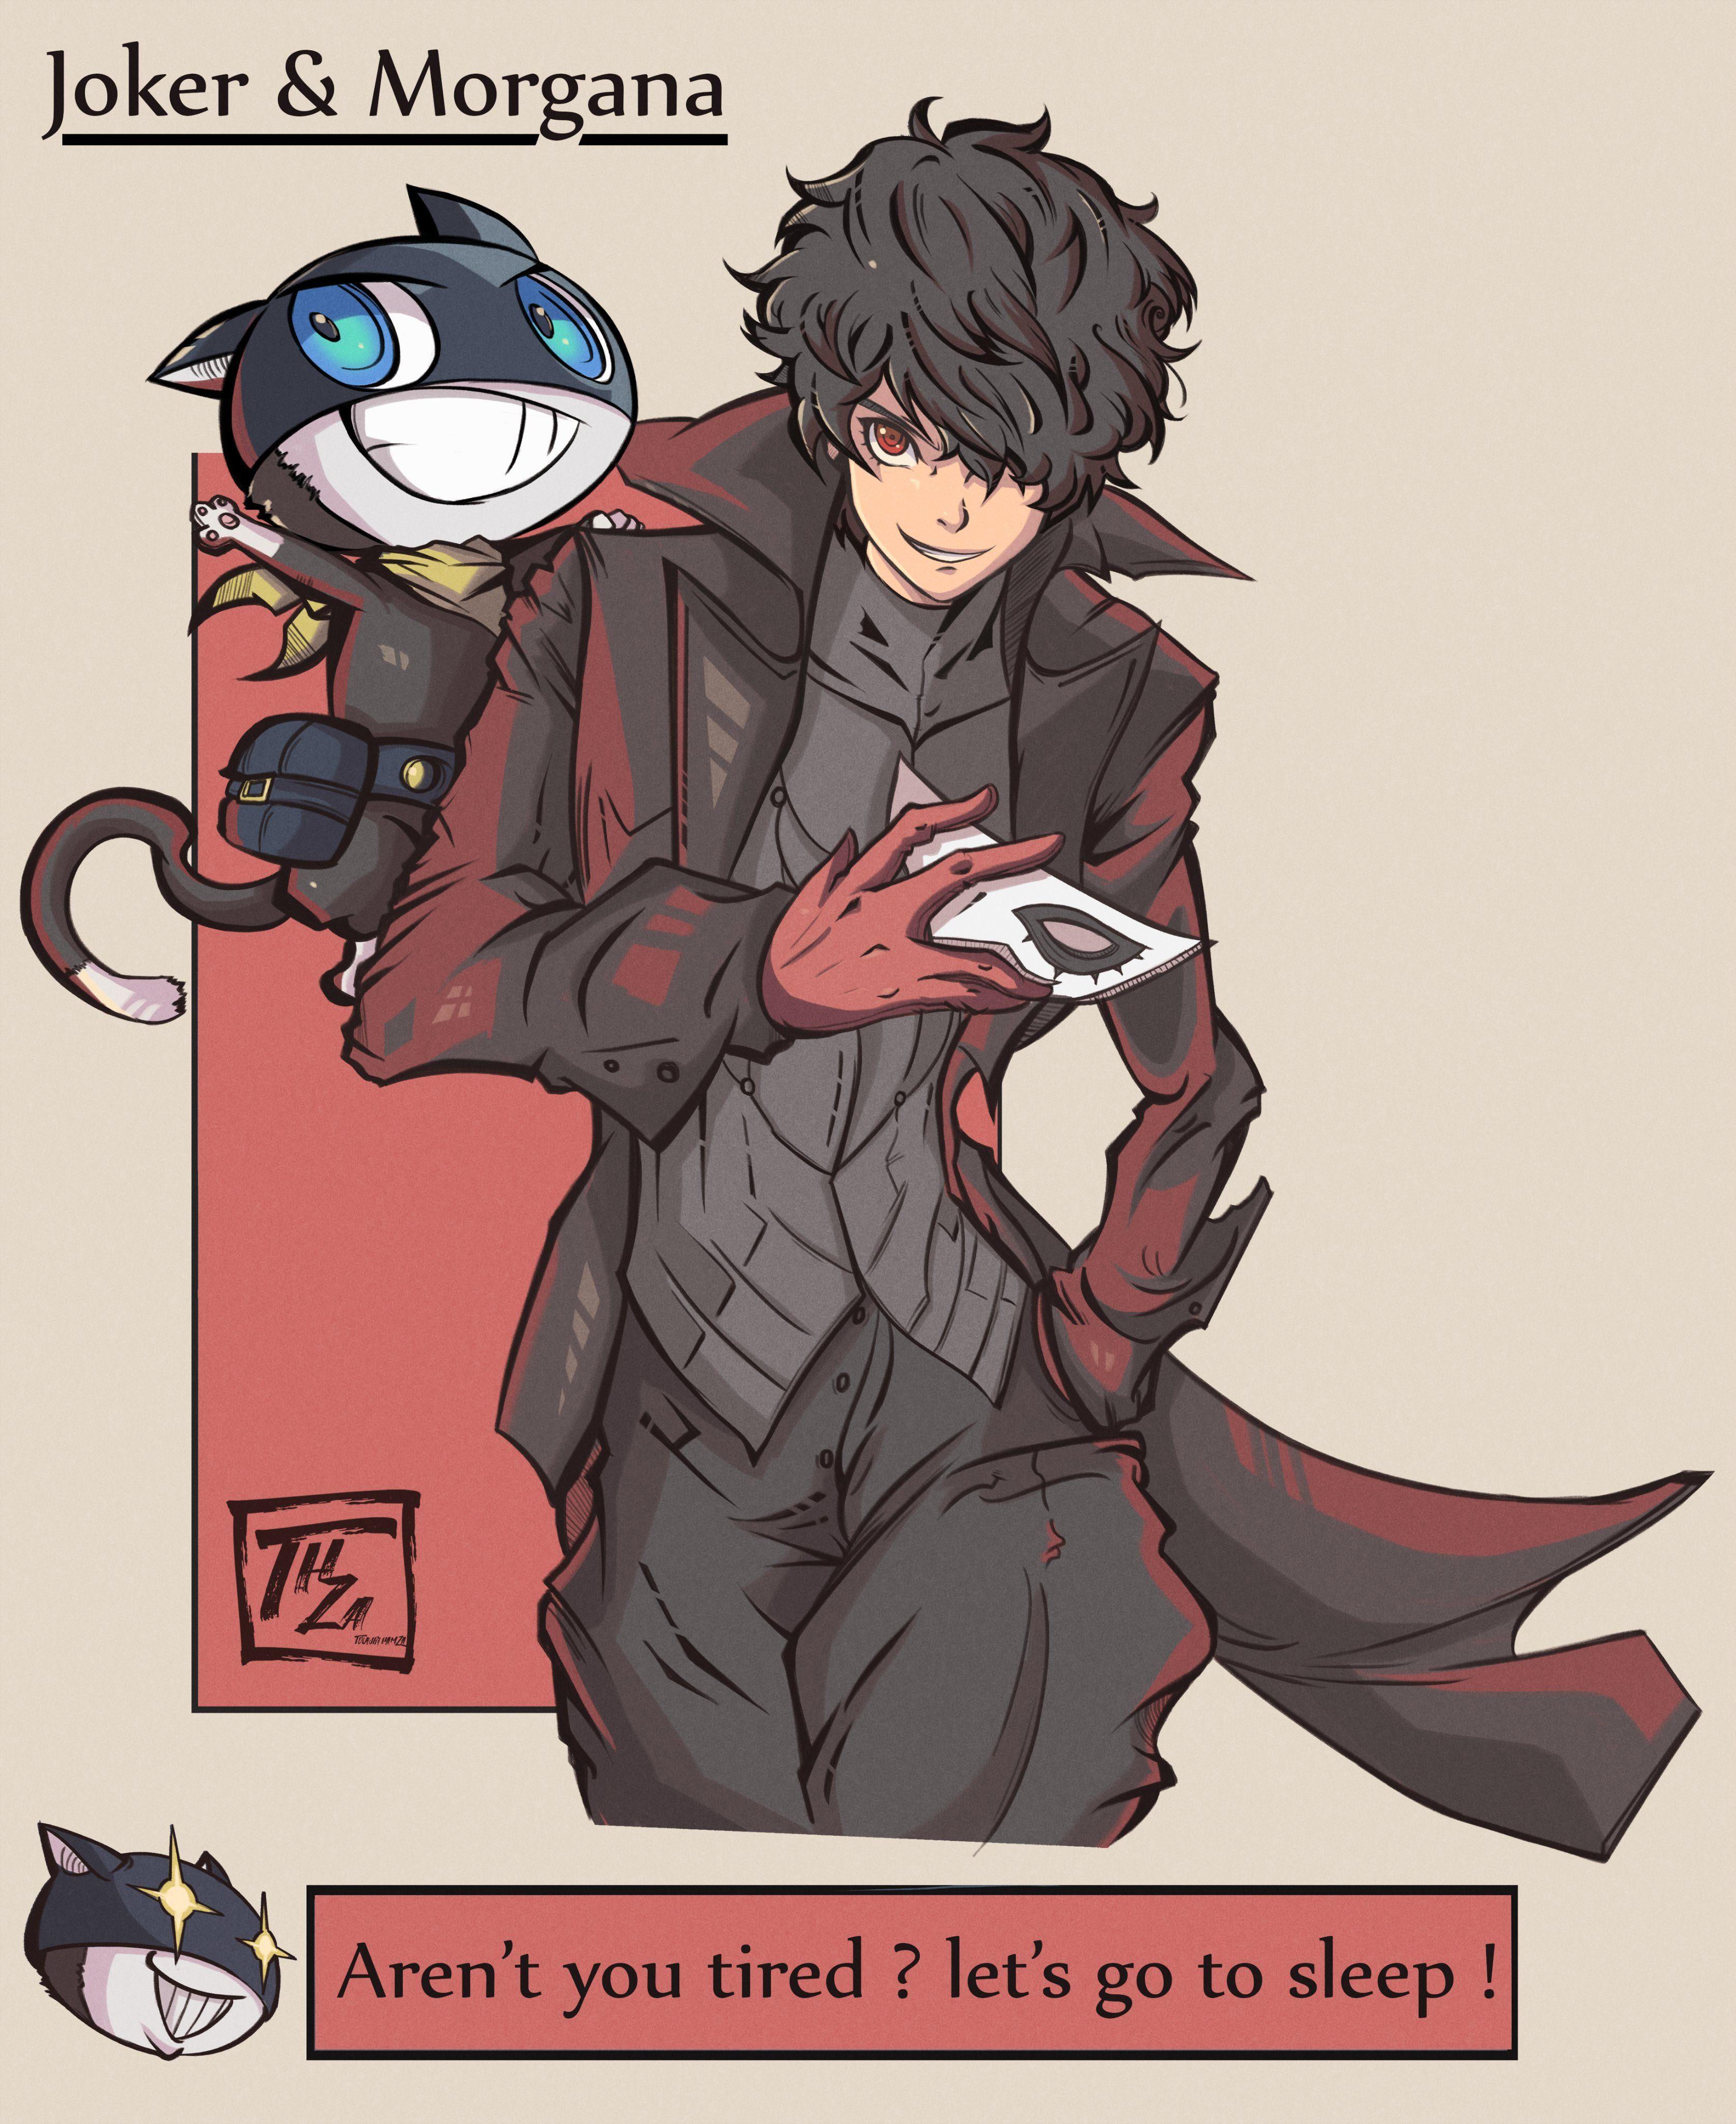 Touijri Hamza on Character art, Persona 5 anime, Persona 5